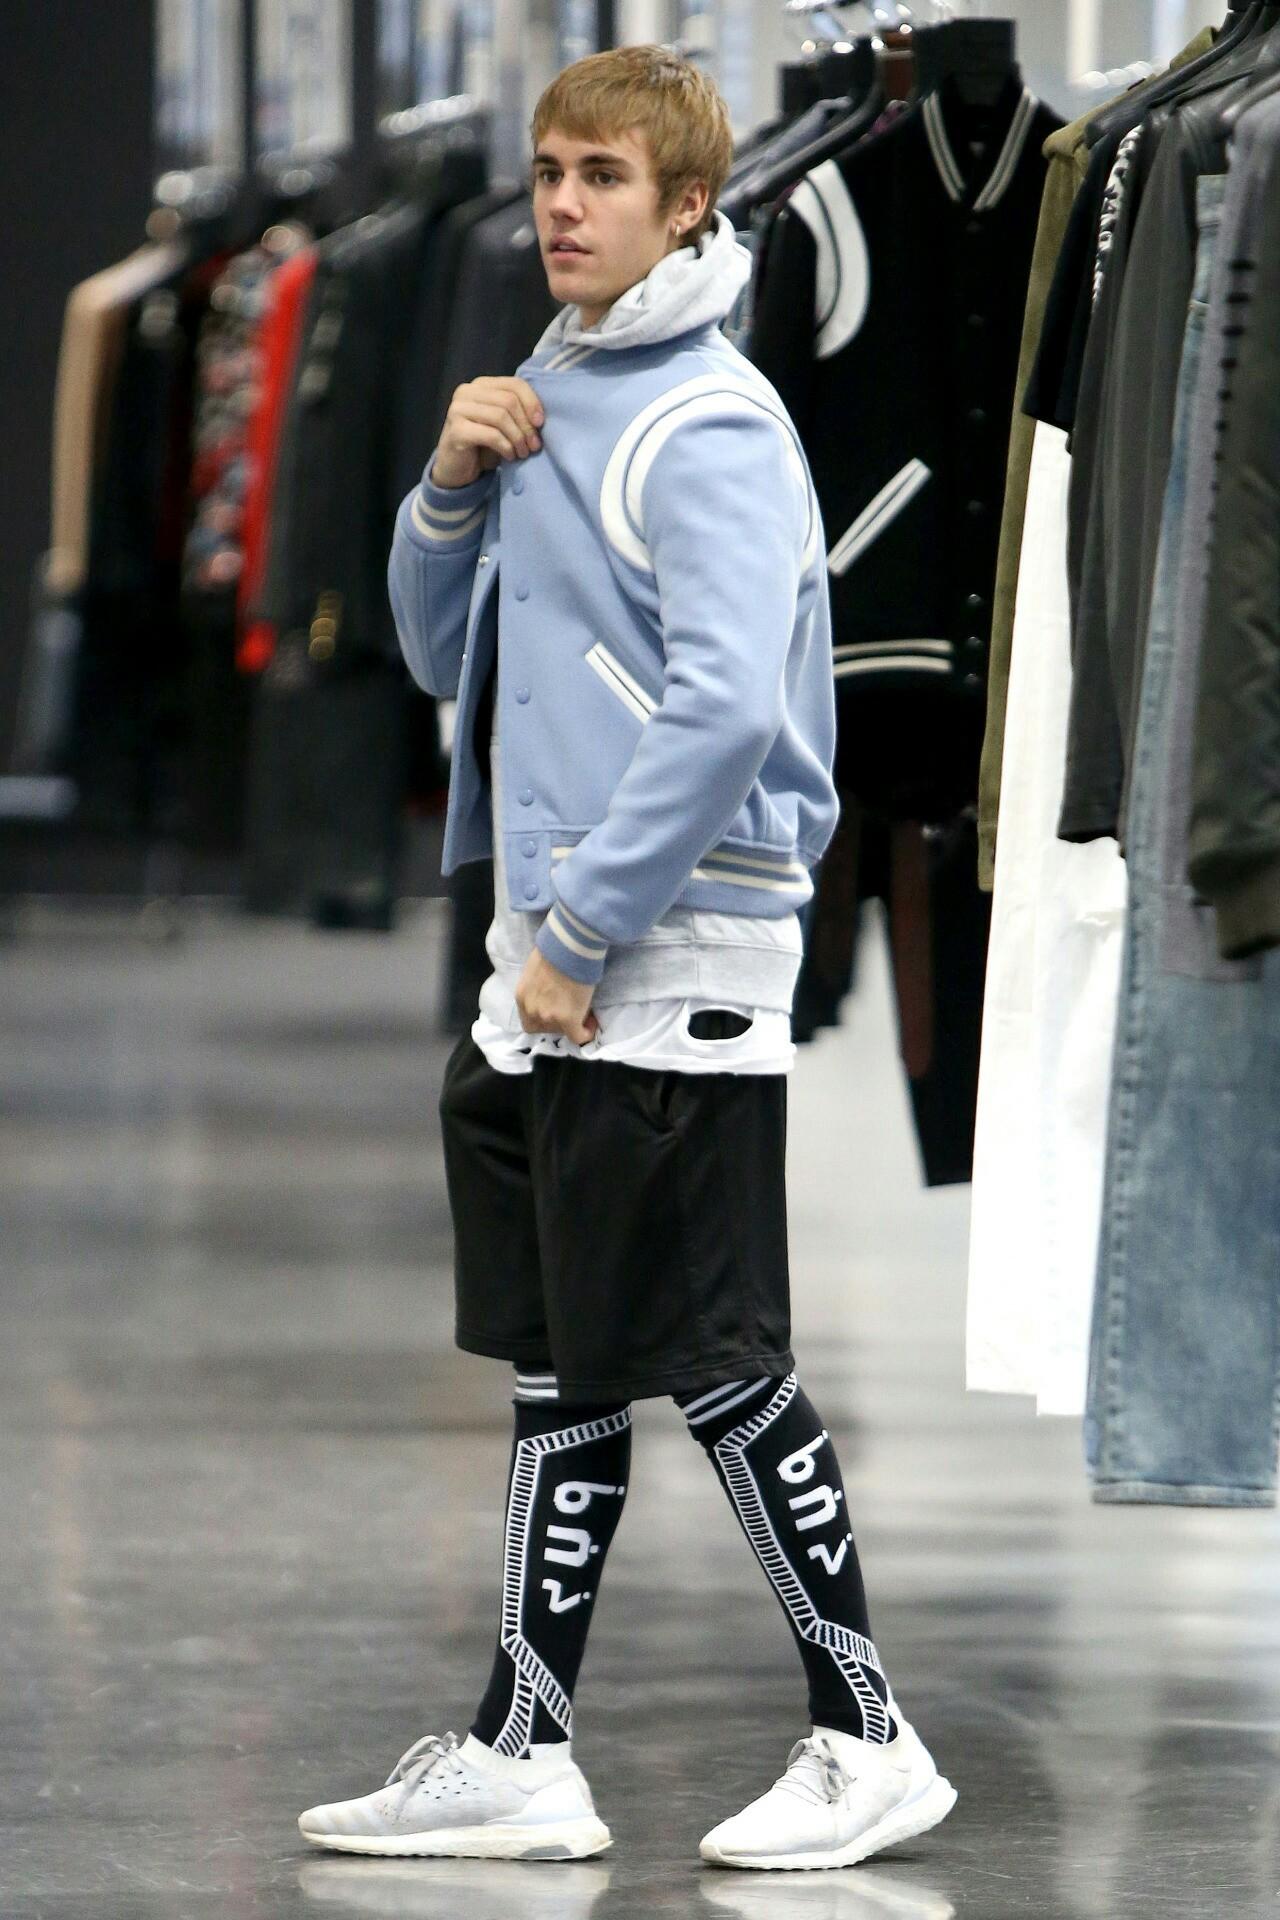 Justin Bieber Tumblr Backgrounds 2018 67 images